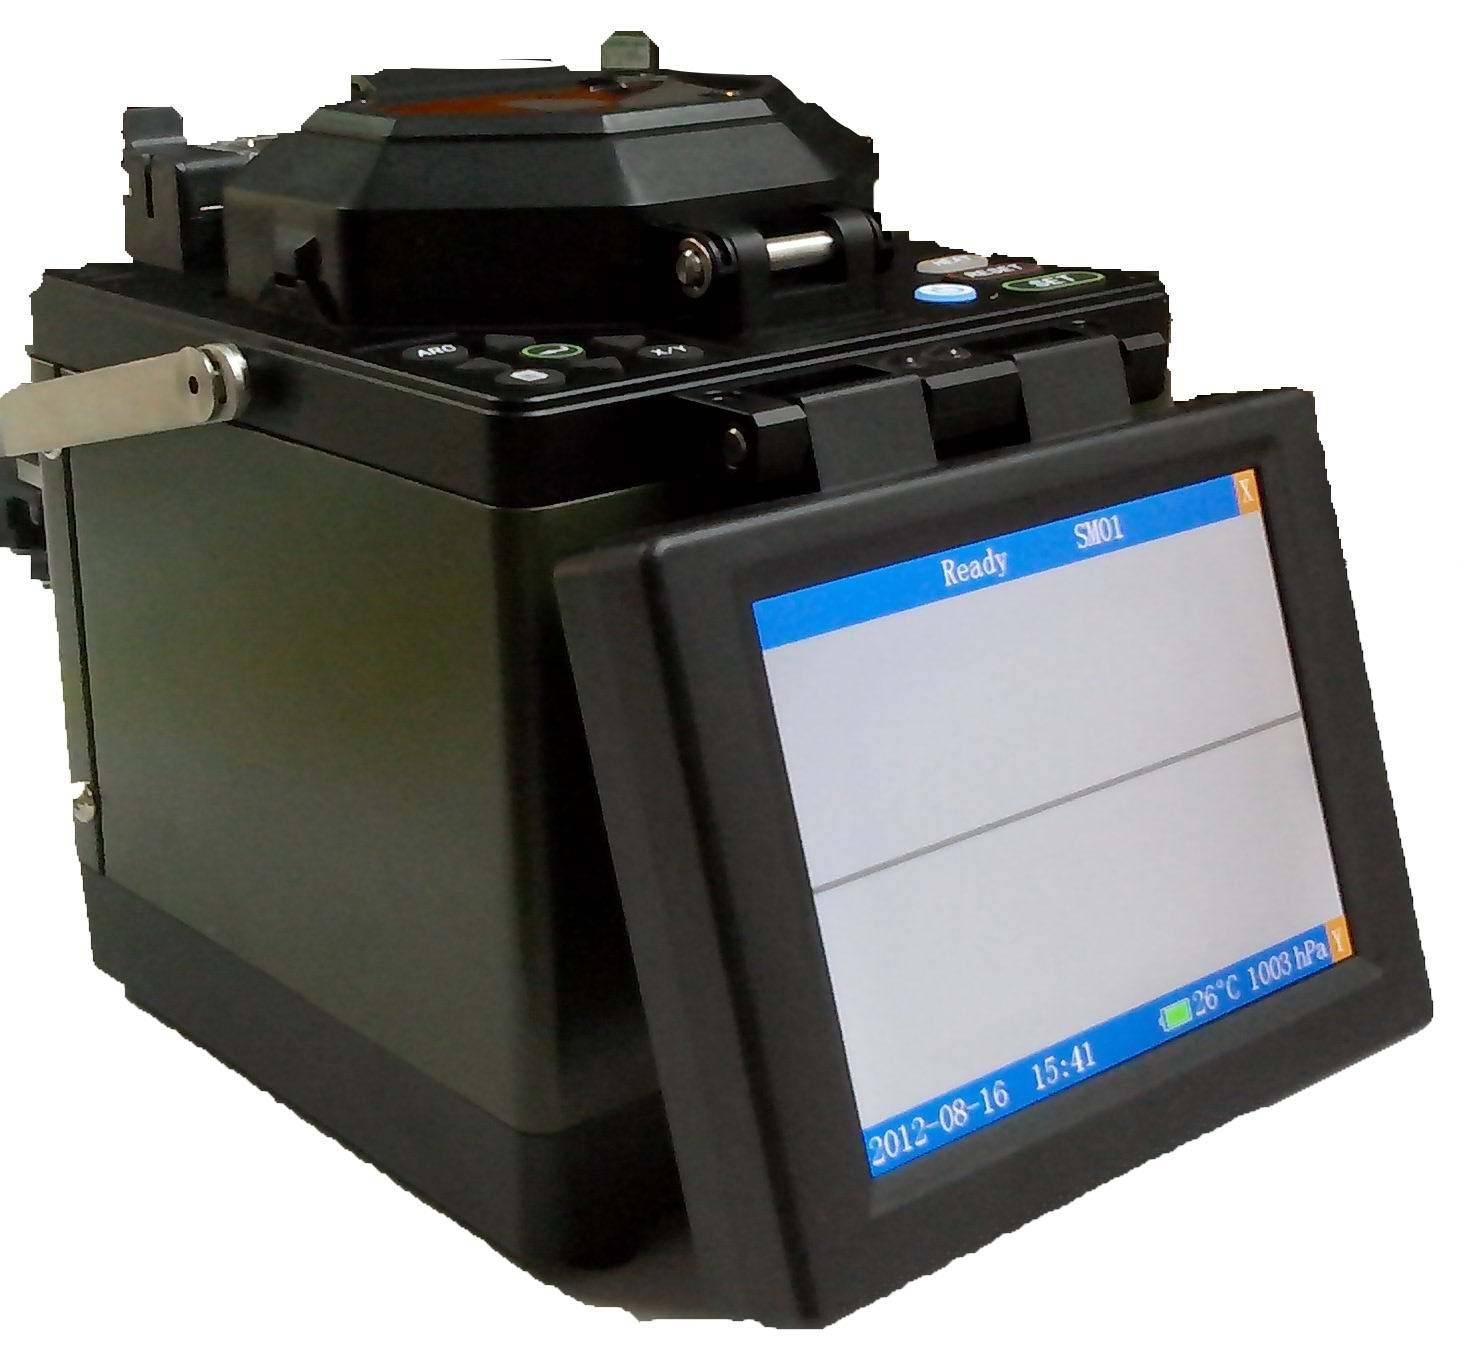 Fusion splicer-JX9010A